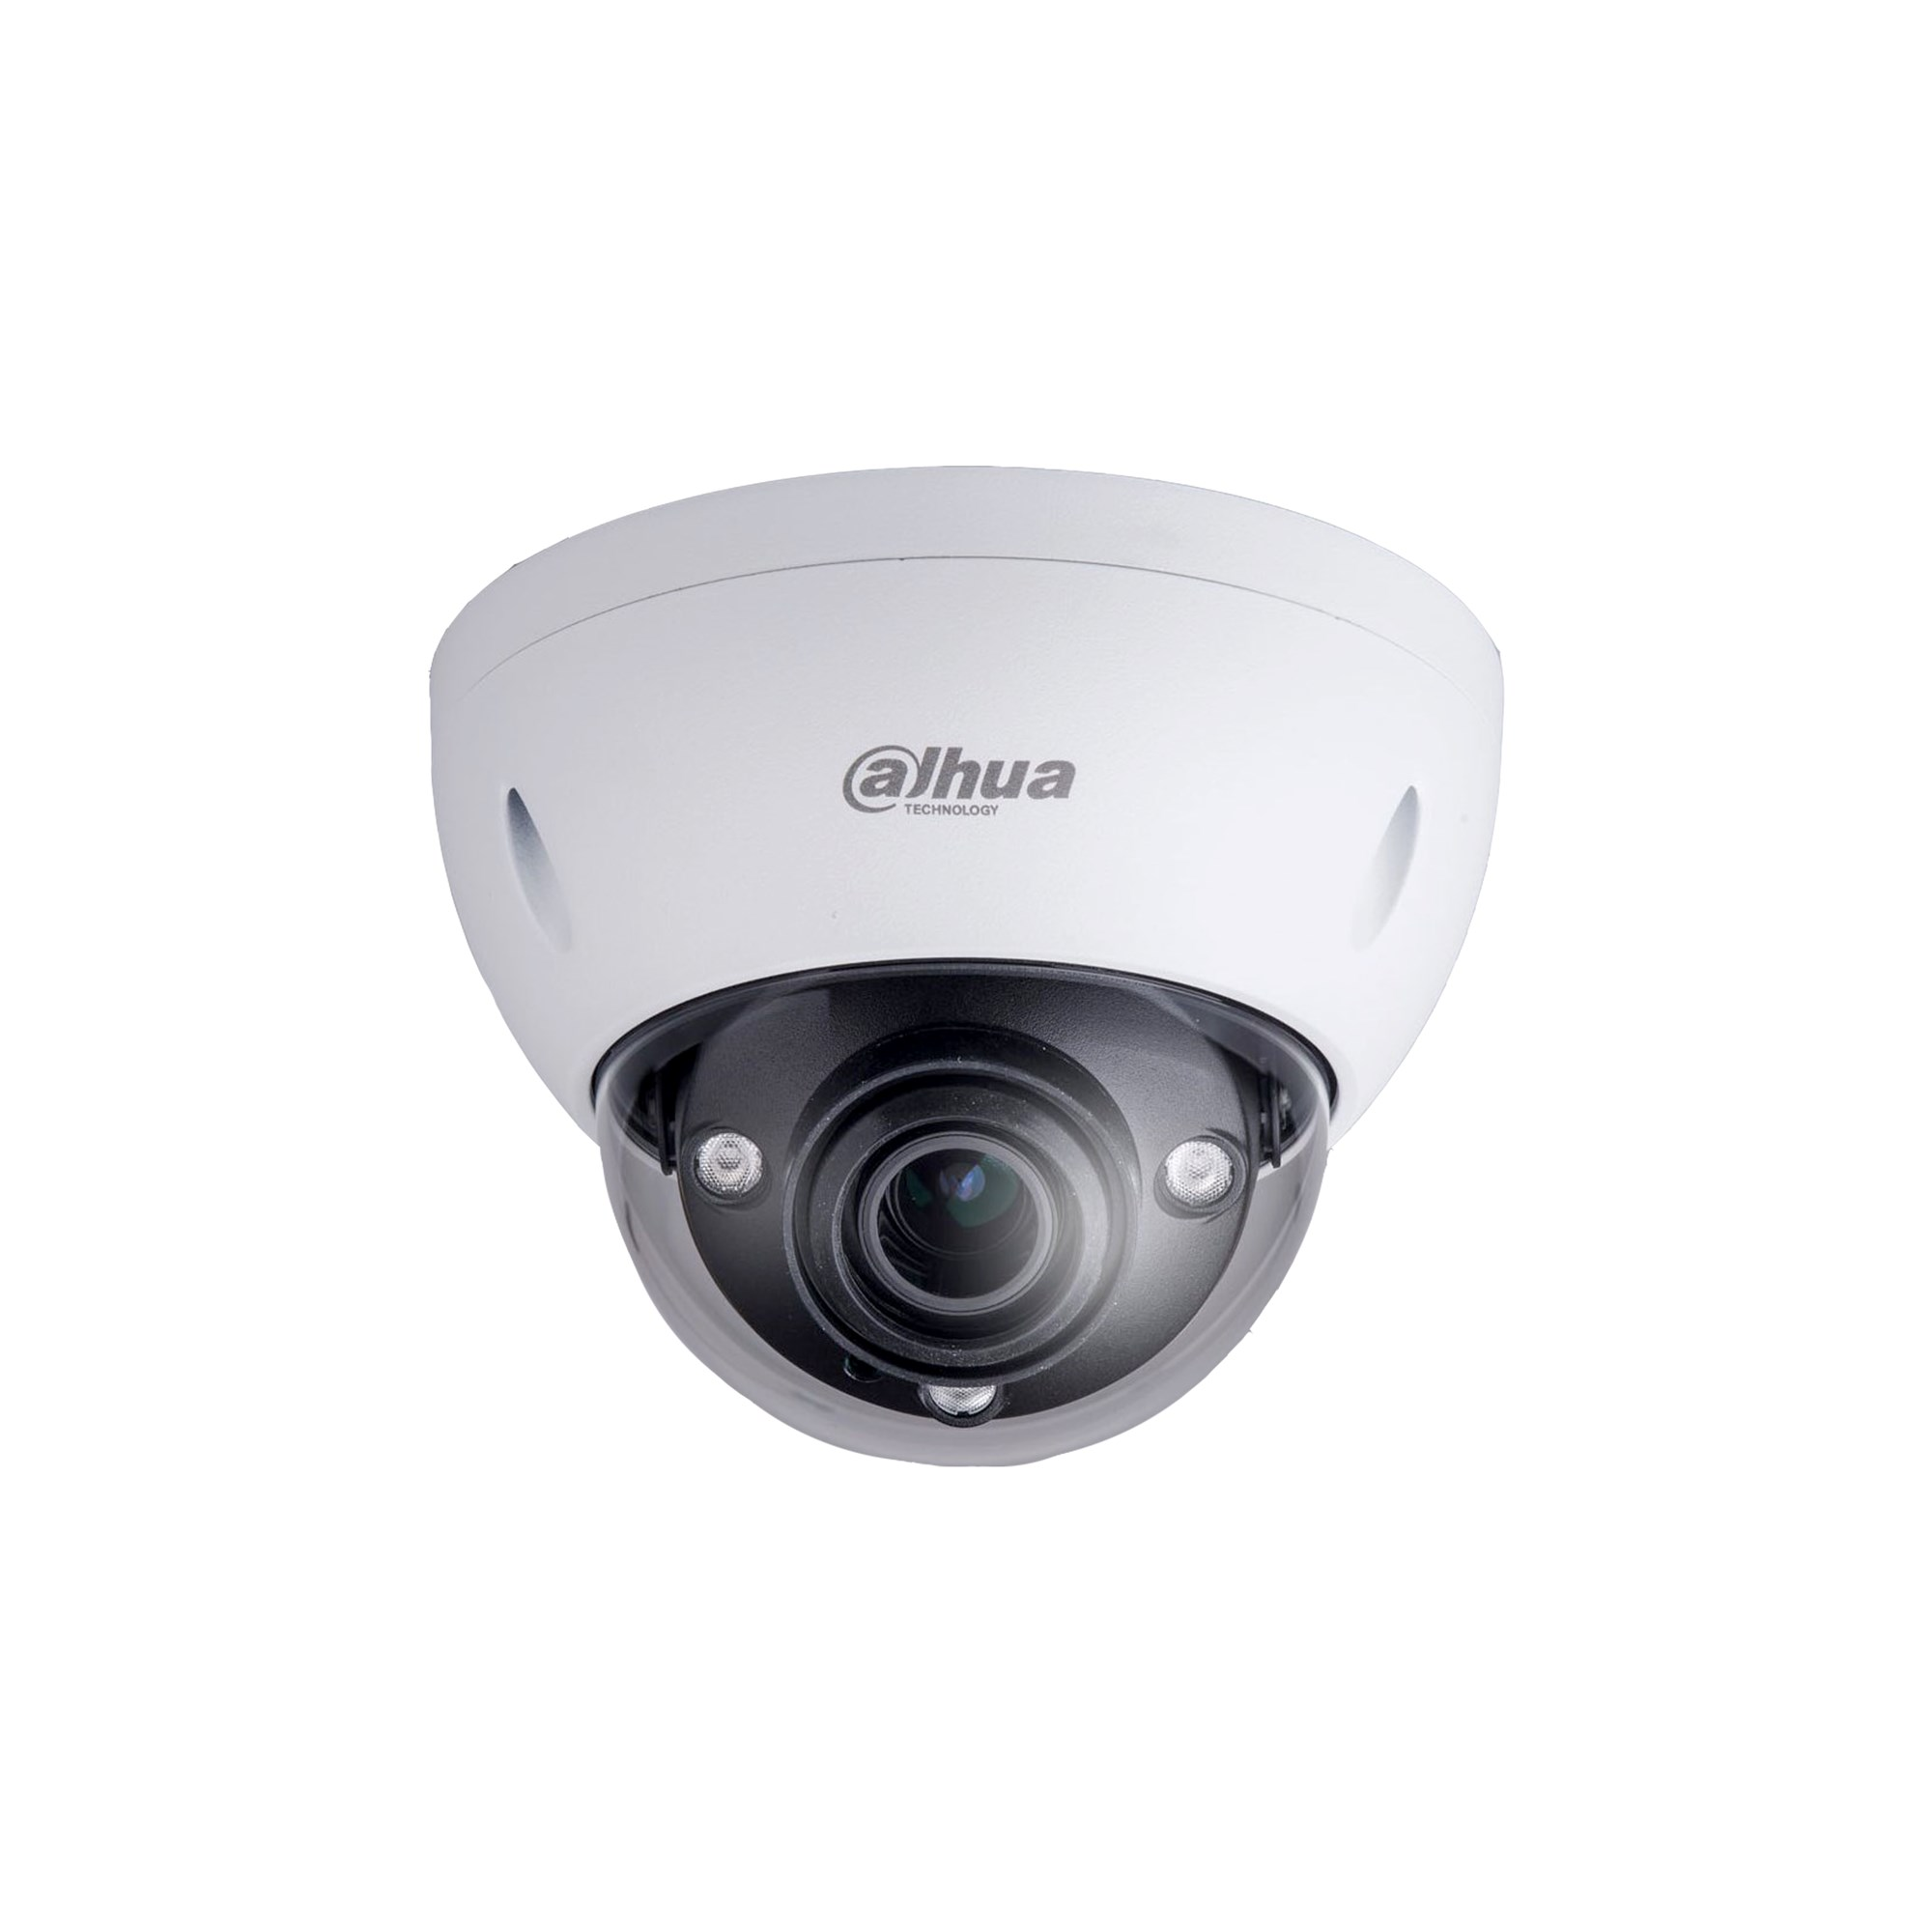 IPC-HDBW81230EP-ZHE  12MP IR Dome Network Camera